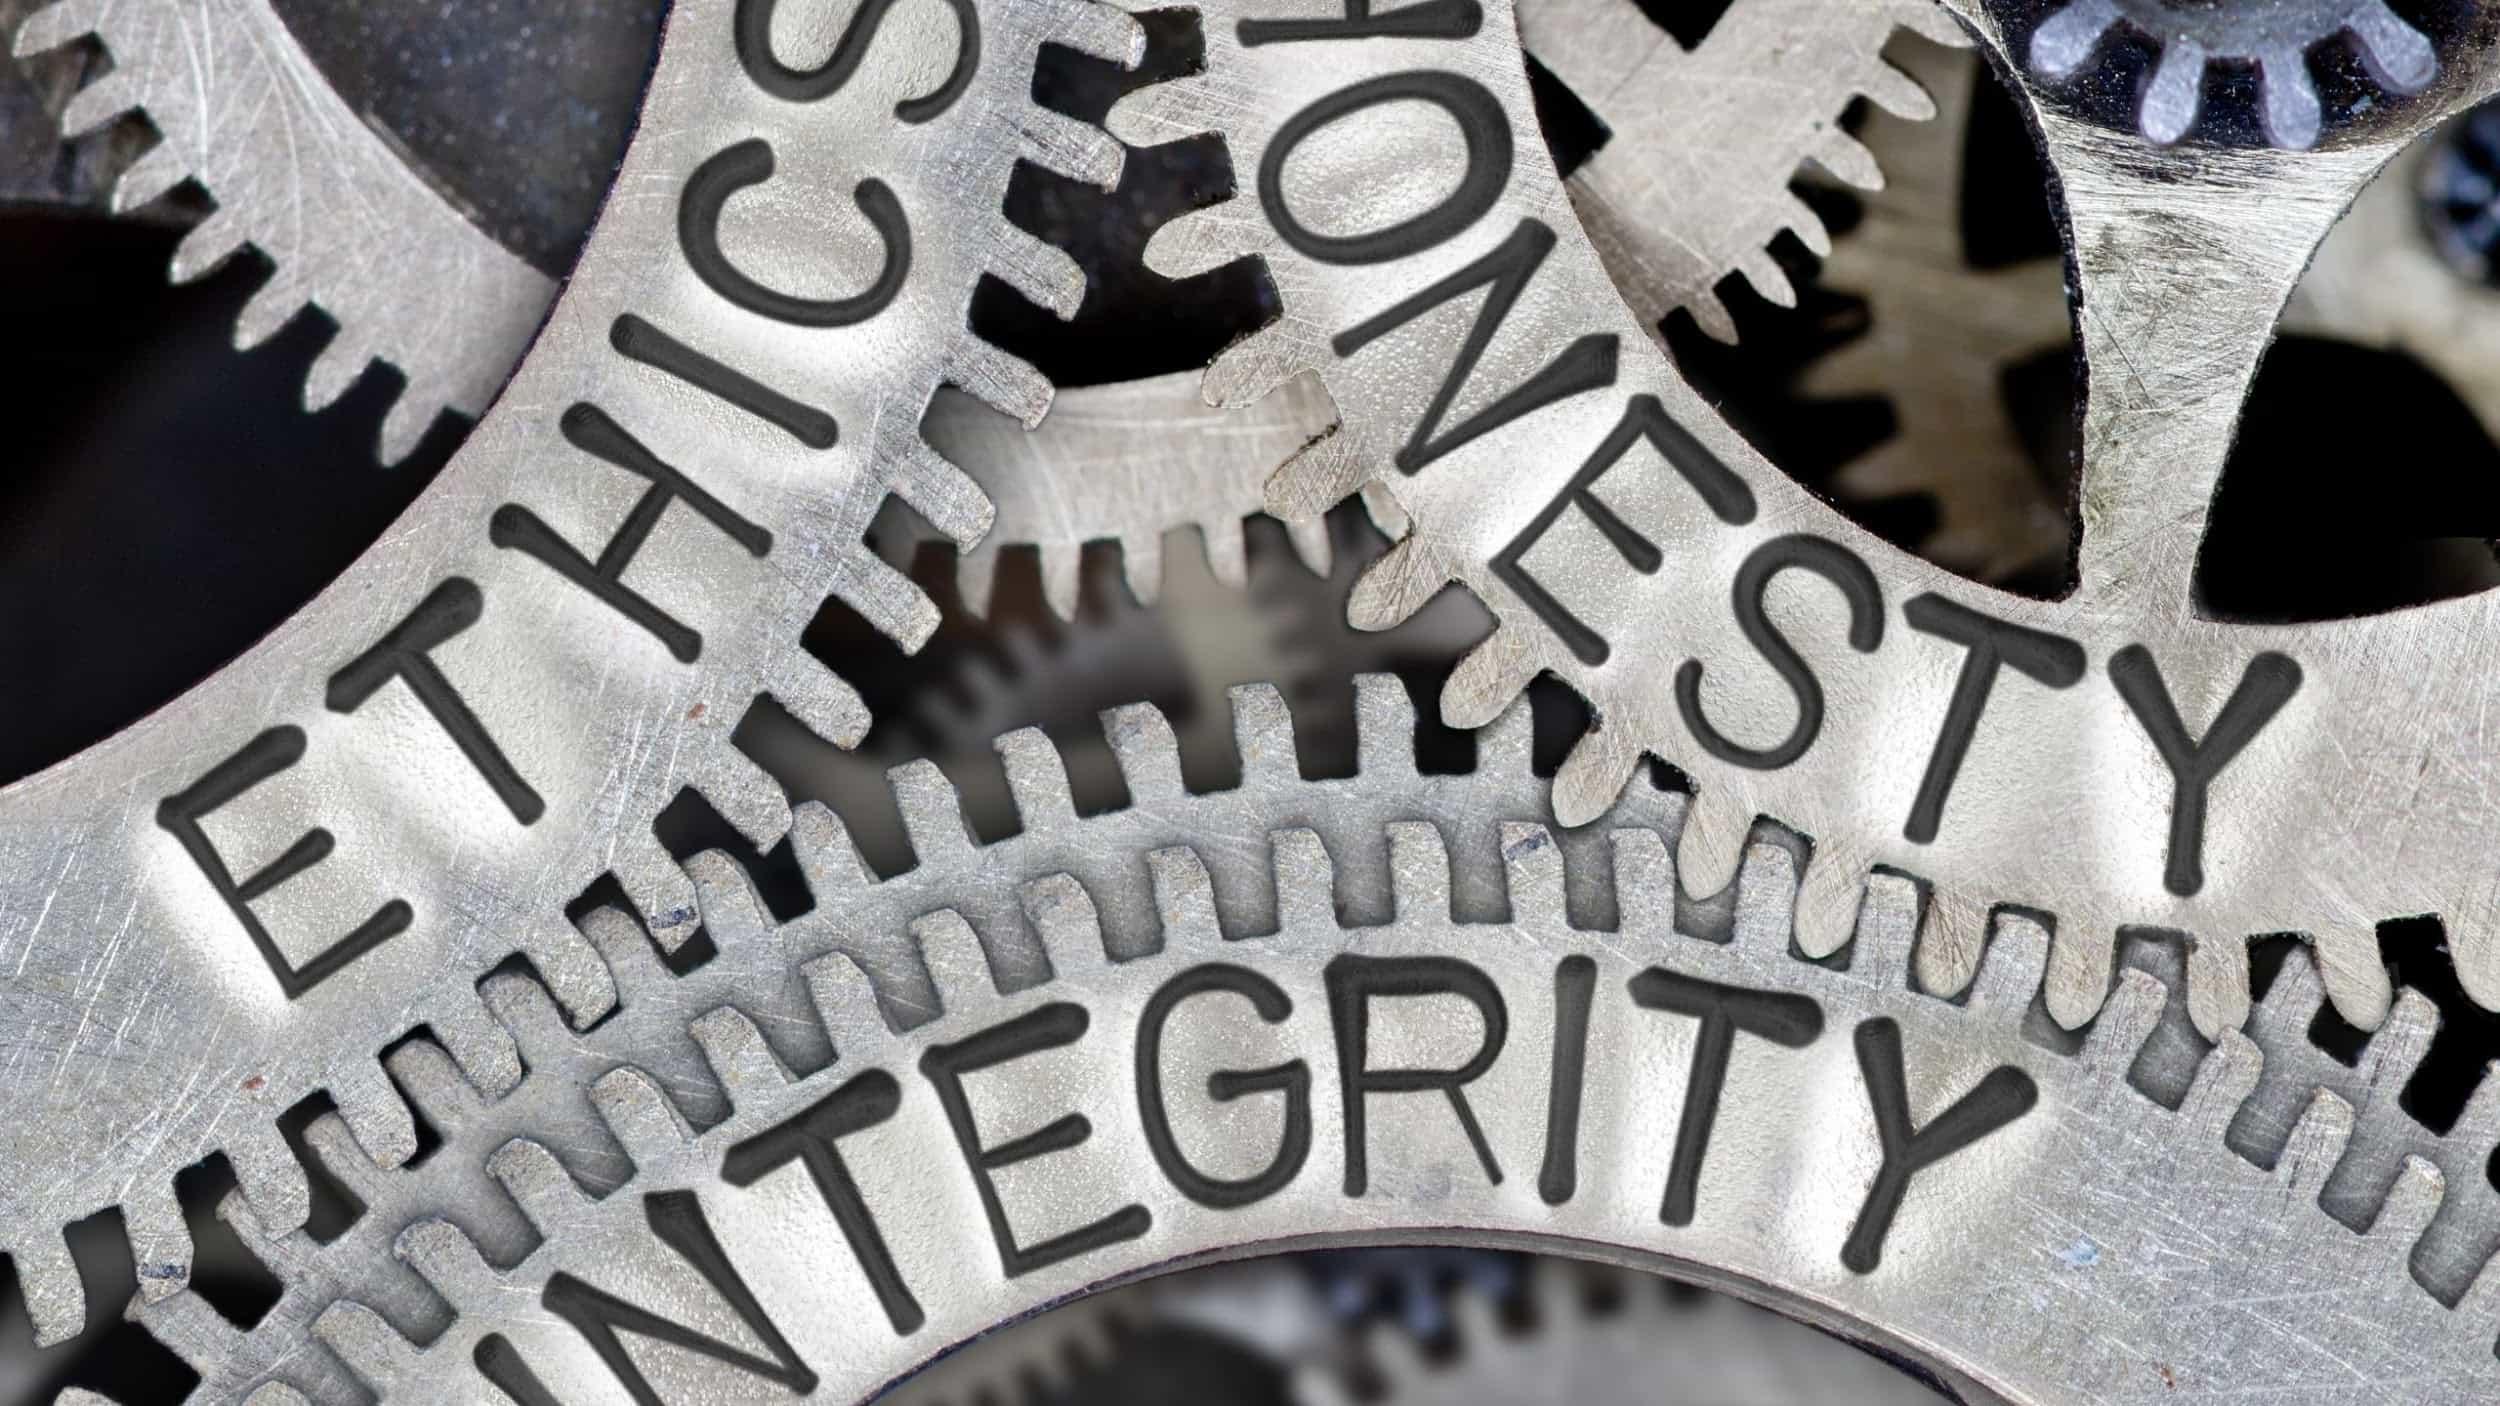 website ethics